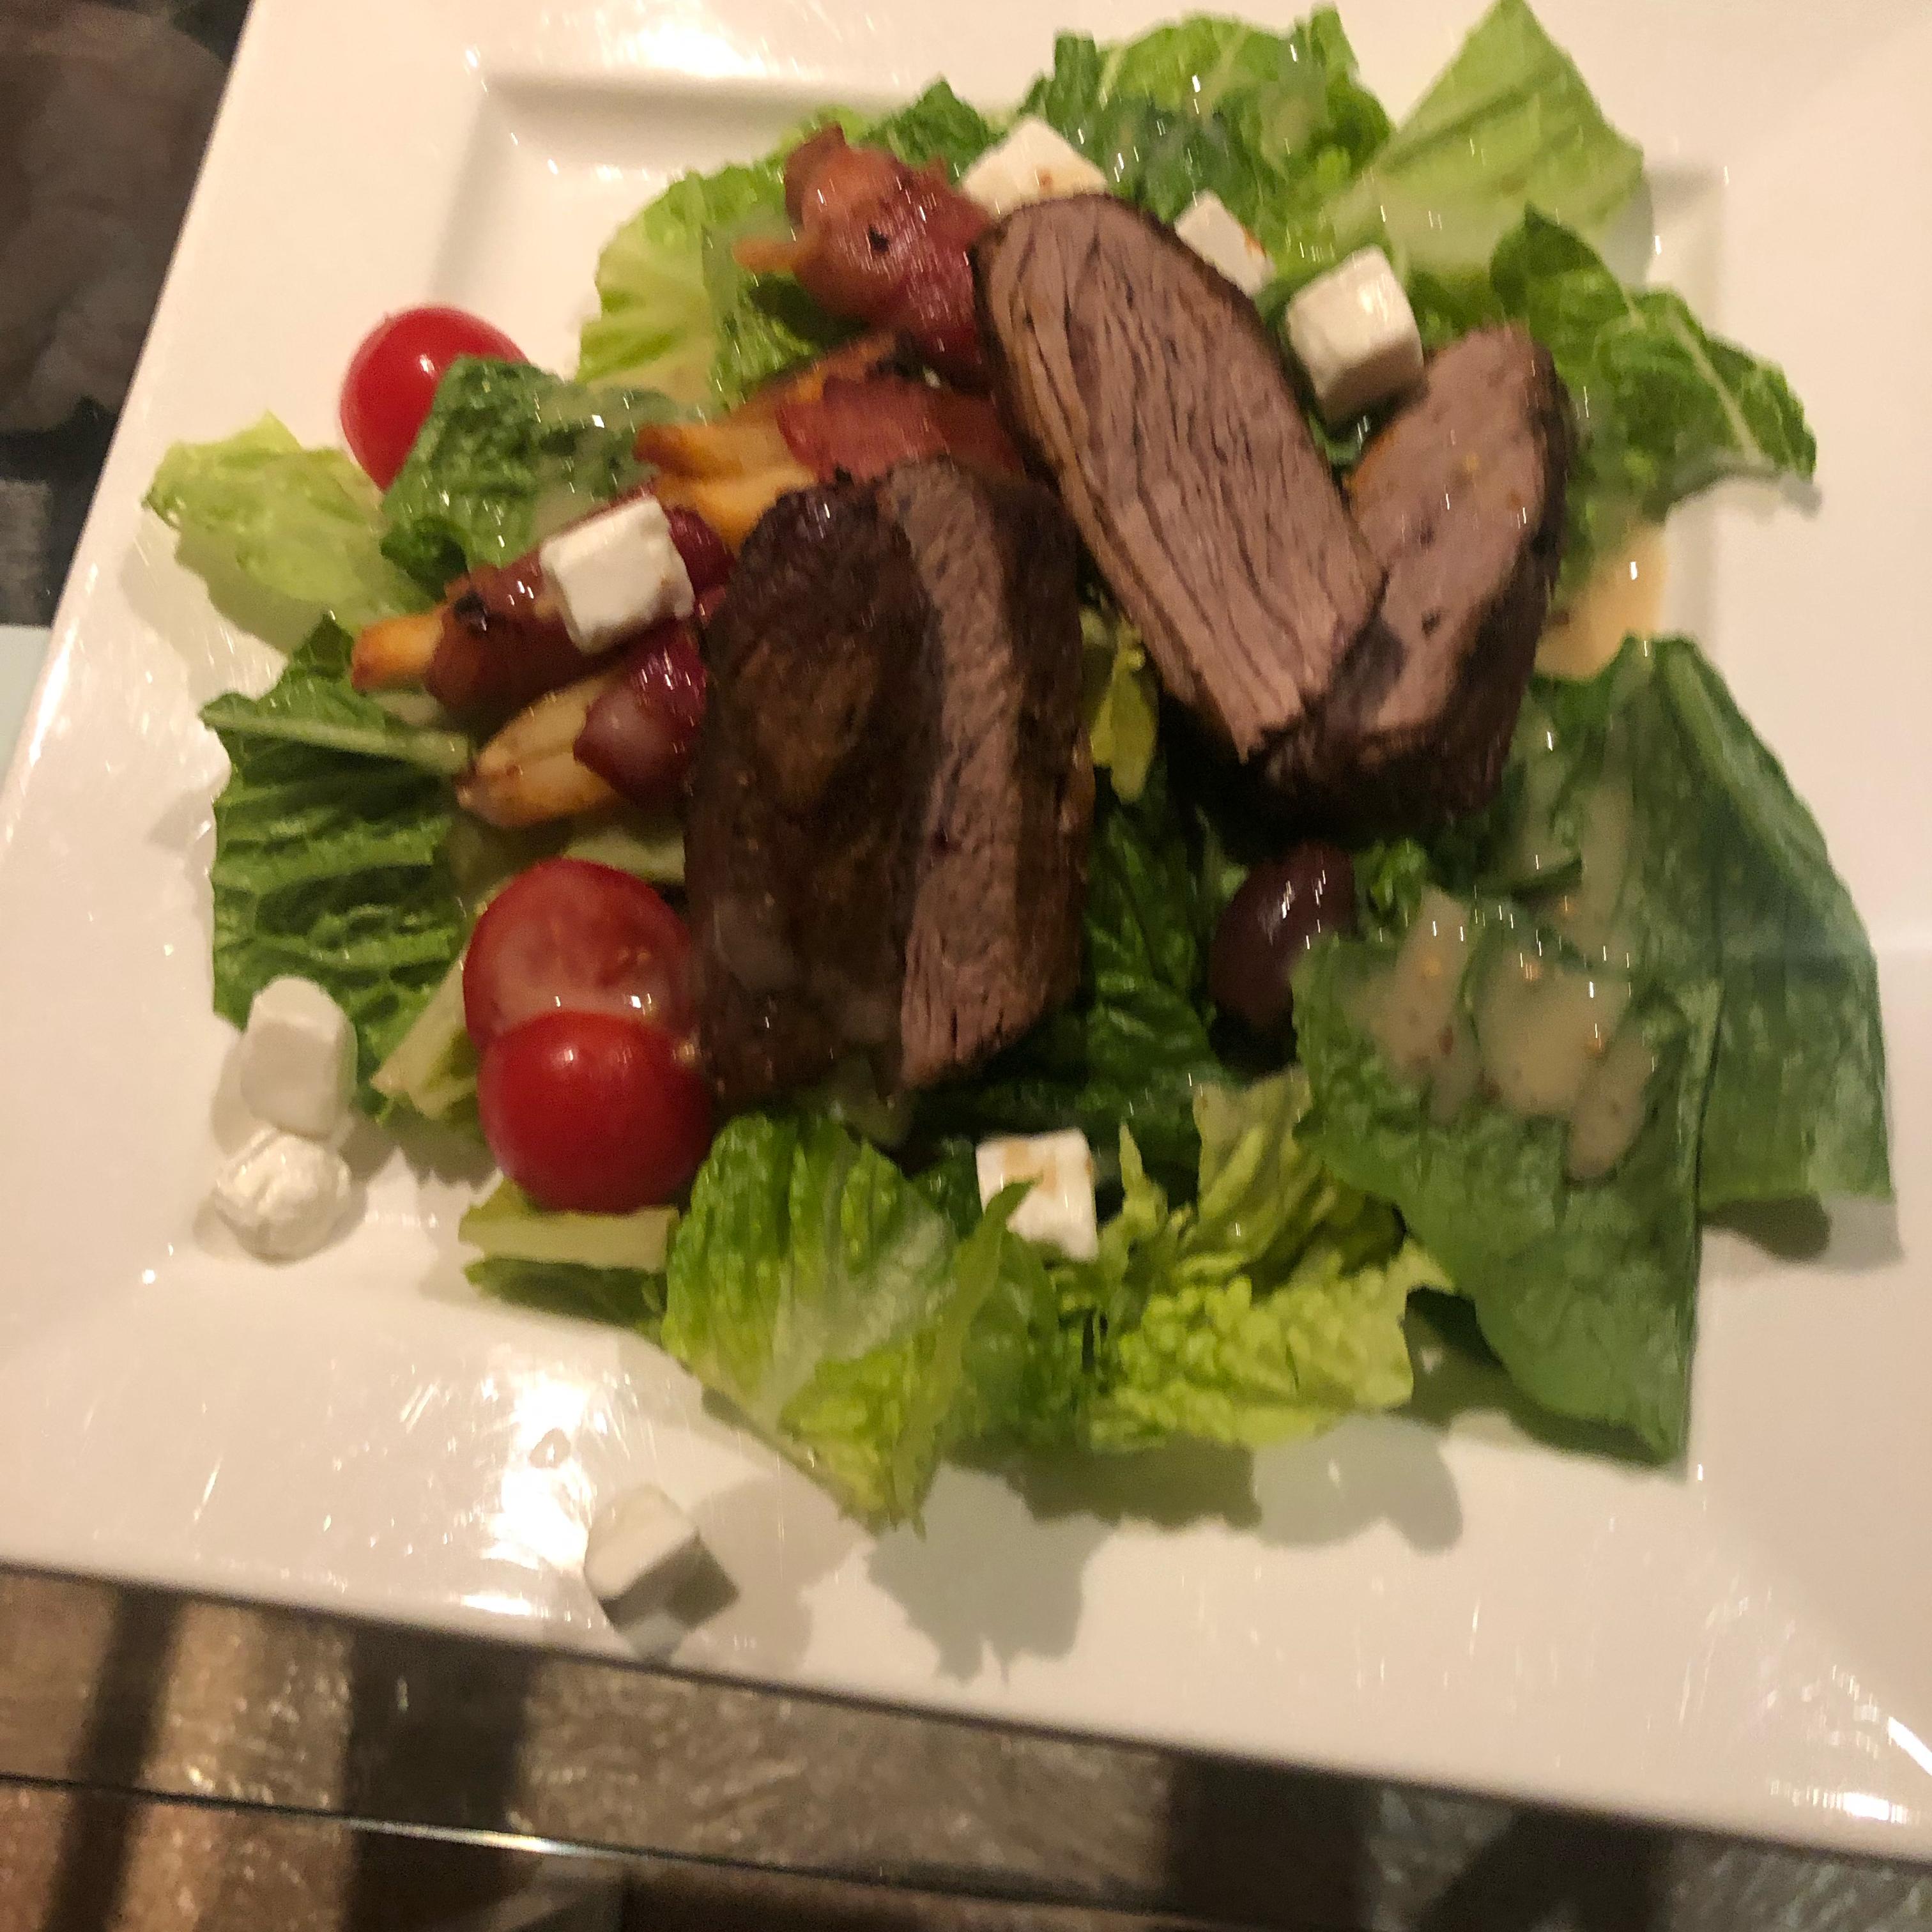 Blackened Steak Salad with Berry Vinaigrette Sean-Jordan Baruch